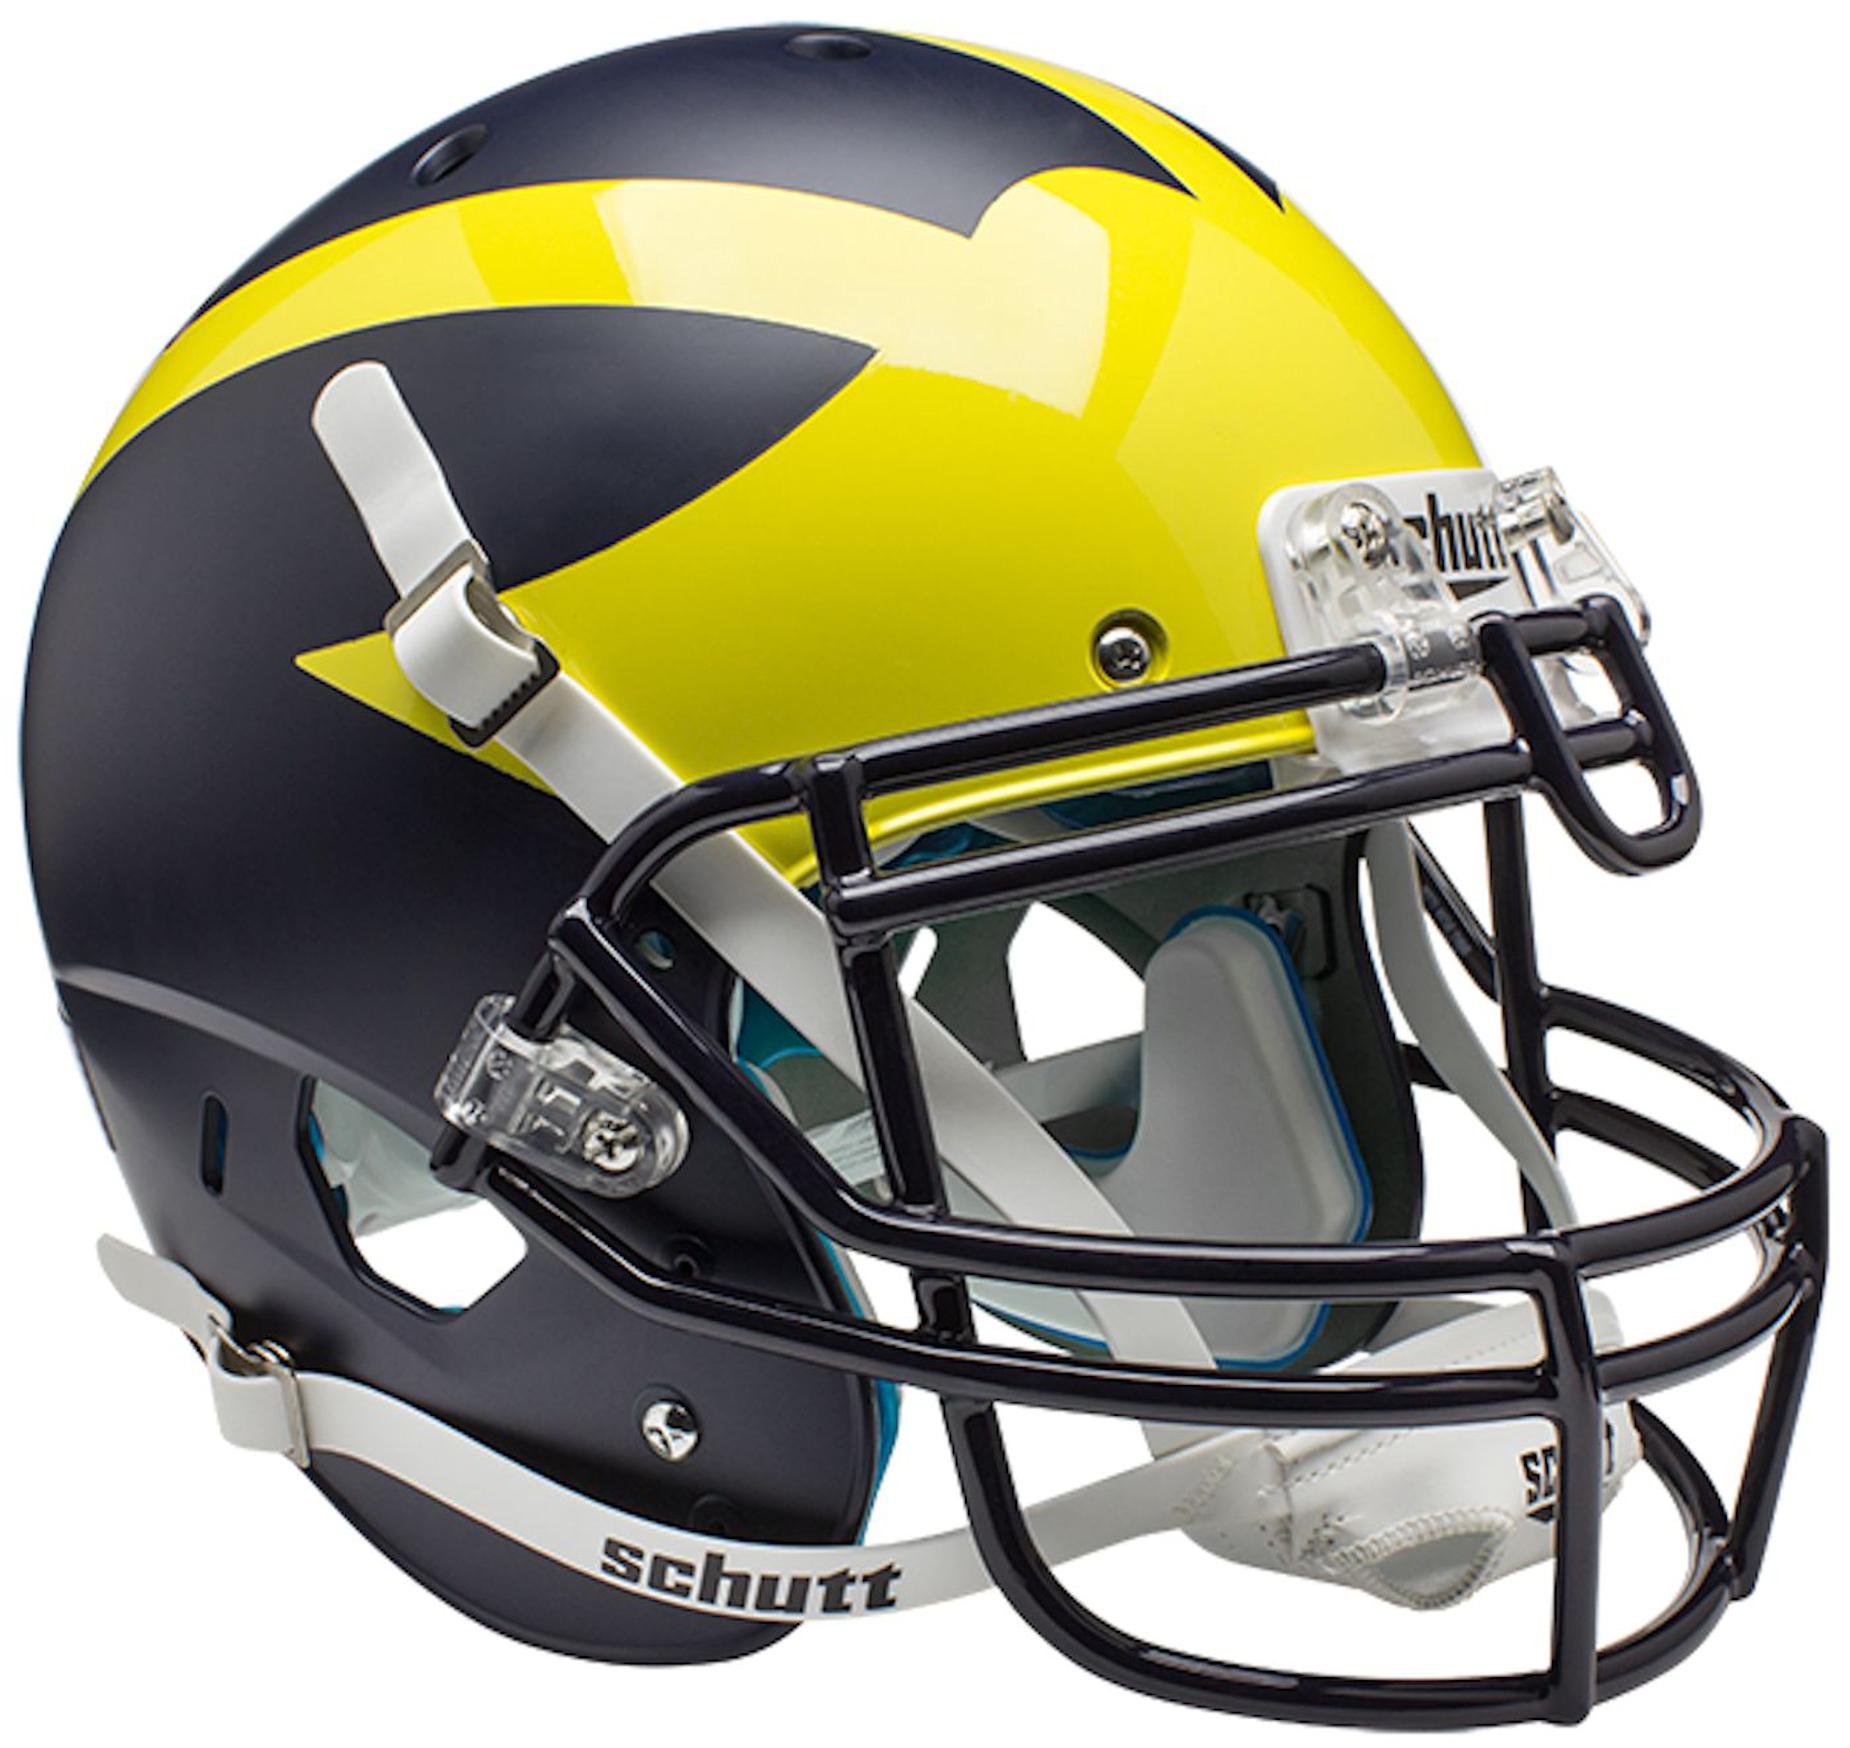 Michigan Wolverines Authentic College XP Football Helmet Schutt <B>2016 Satin Blue</B>